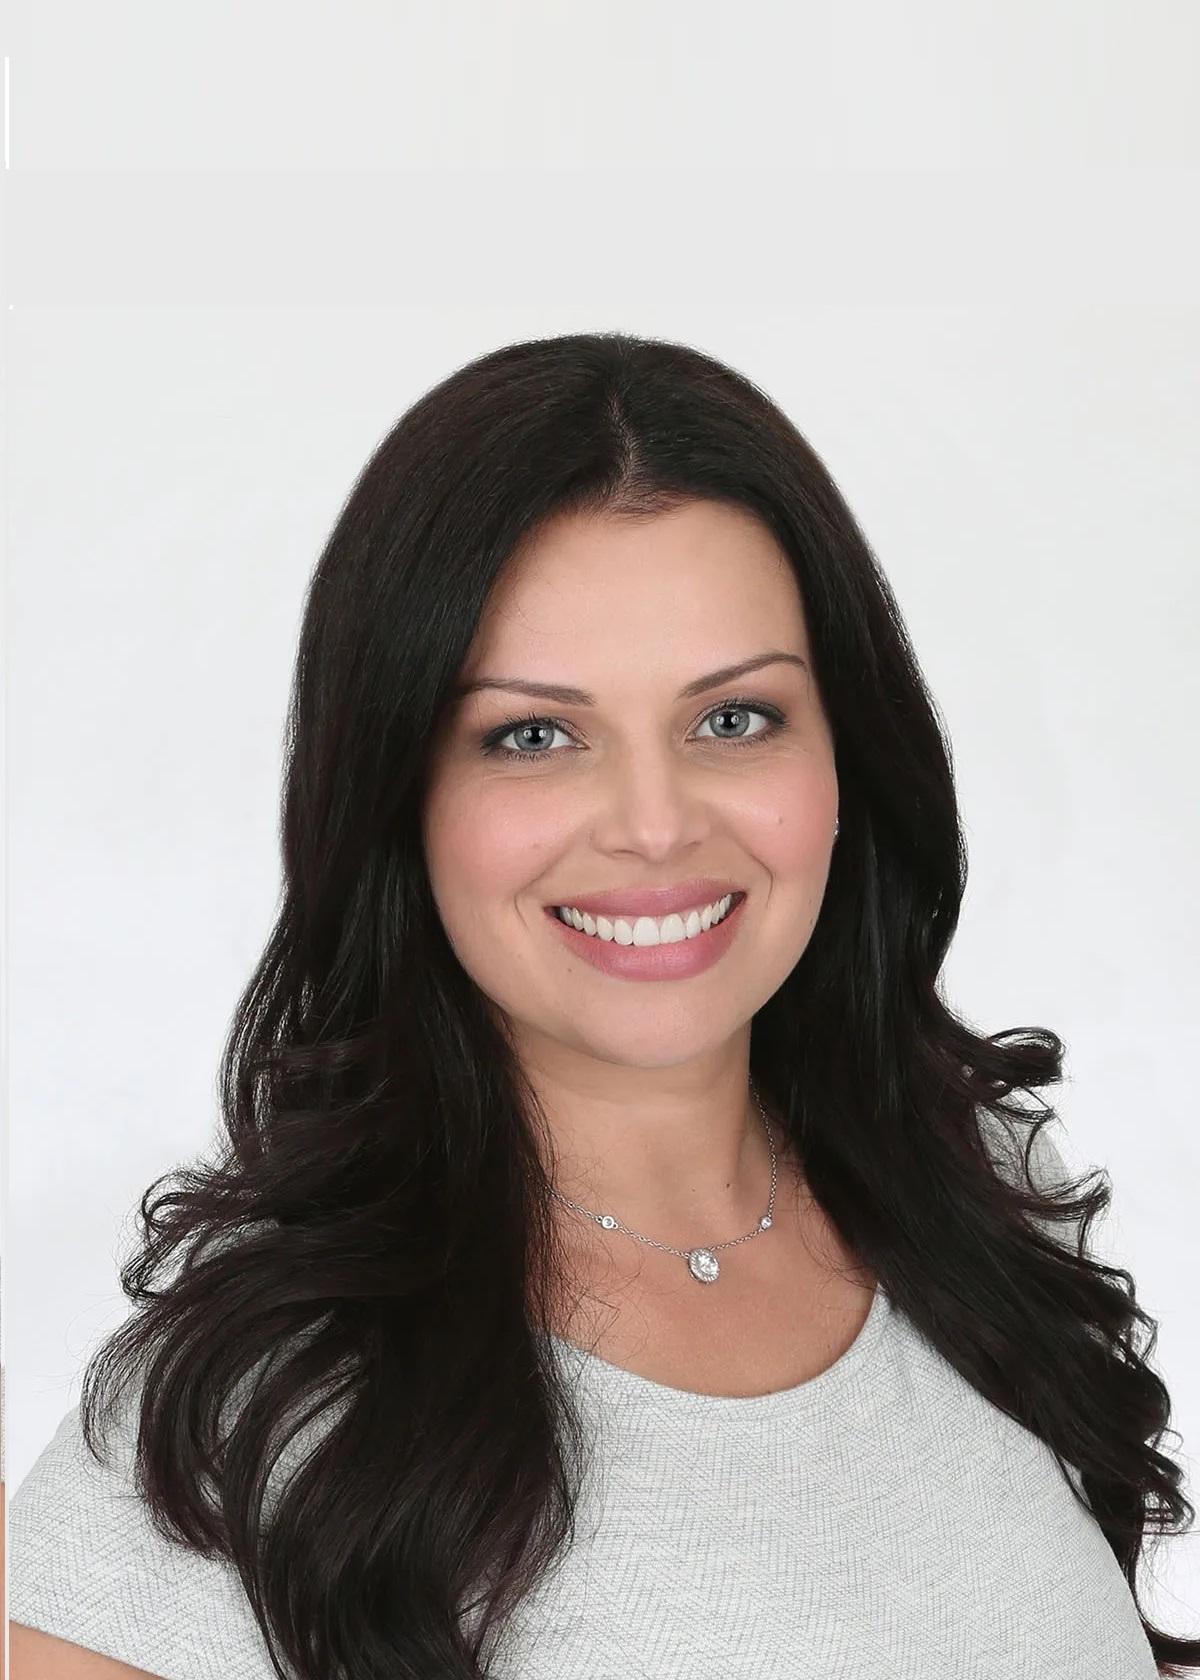 Reyza Tanen